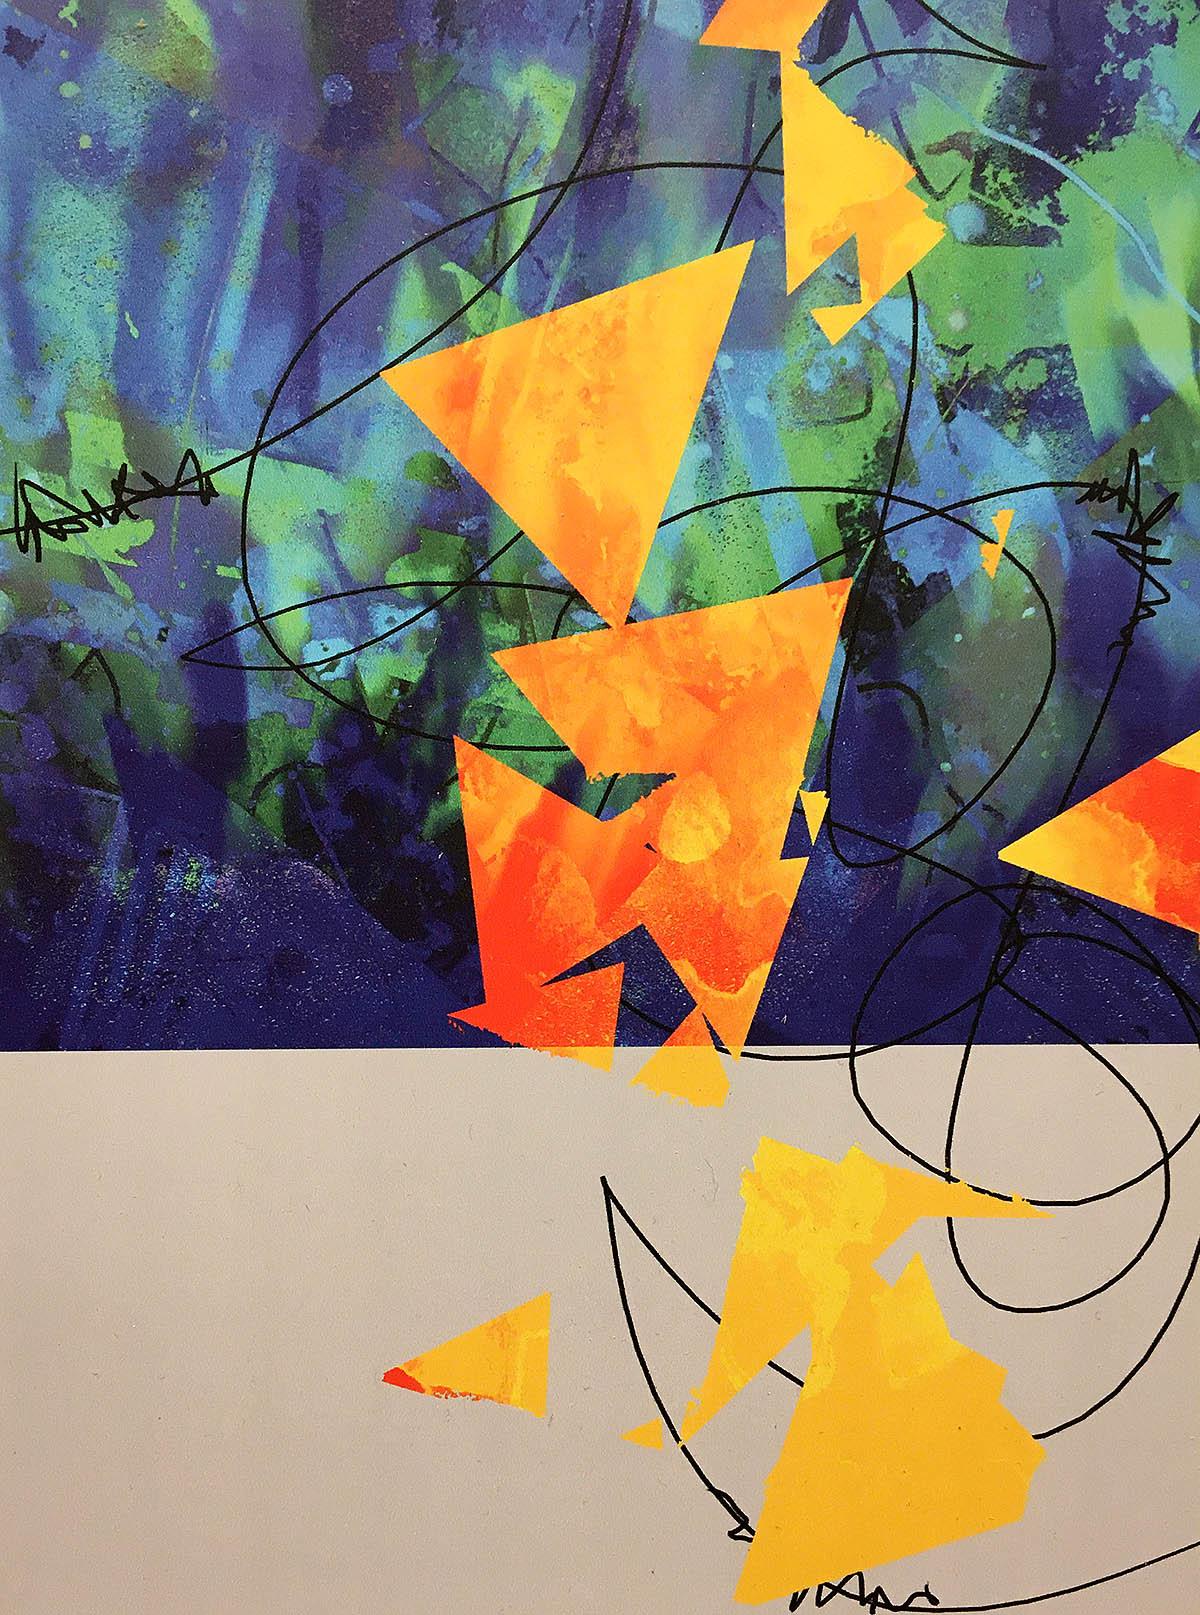 Krisztina Horvath, Moray School of Art, University of Highlands & Islands